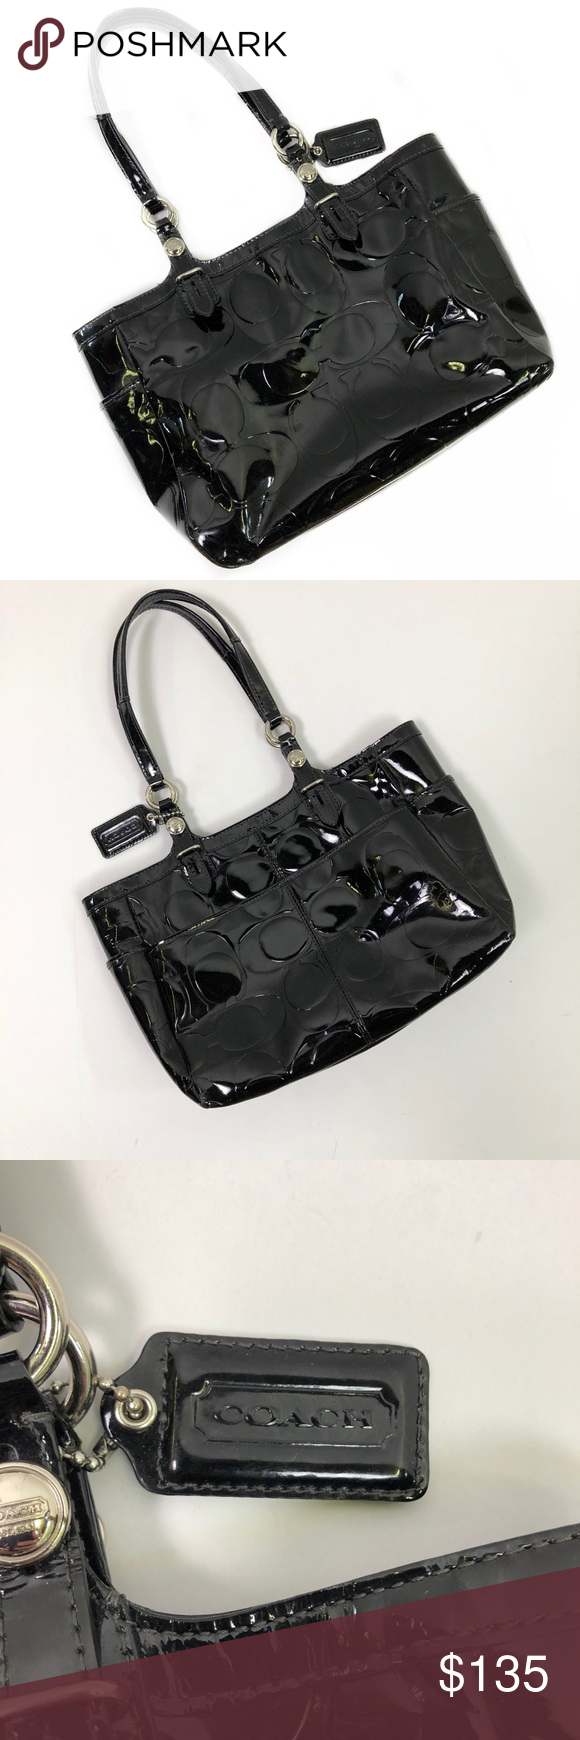 Black Embossed Patent Leather Purse